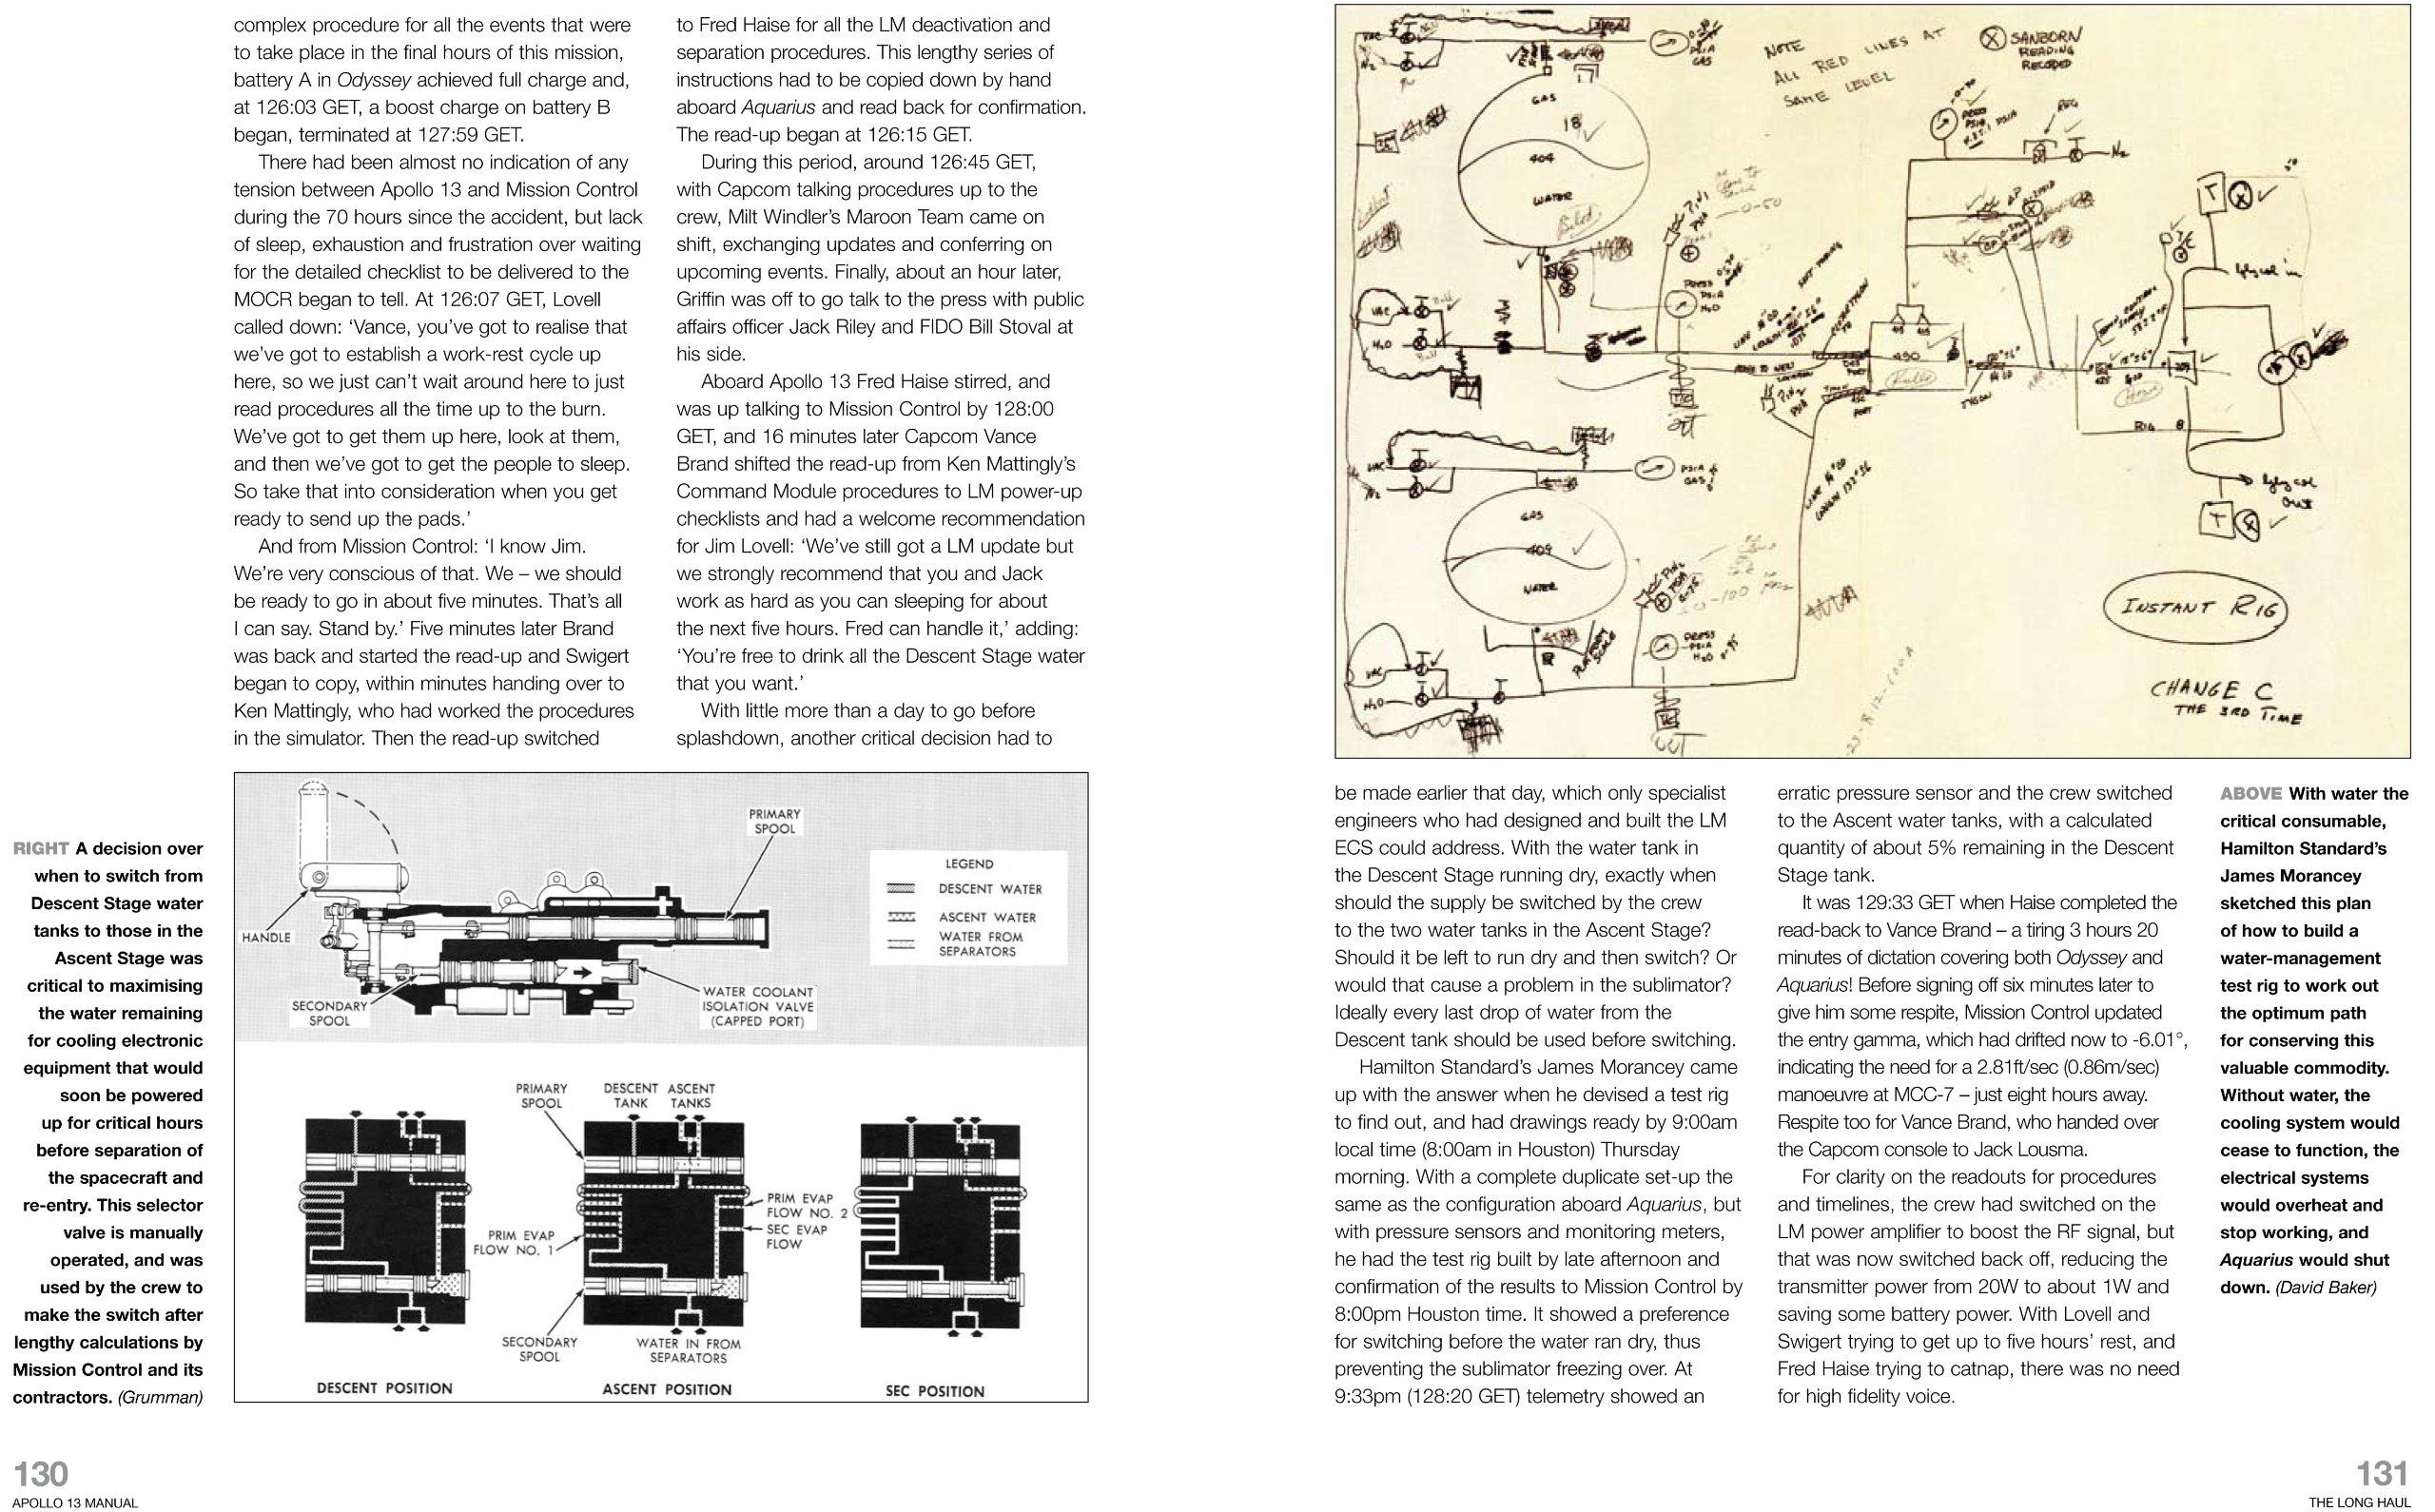 Apollo 13 Manual: An engineering insight into how NASA saved